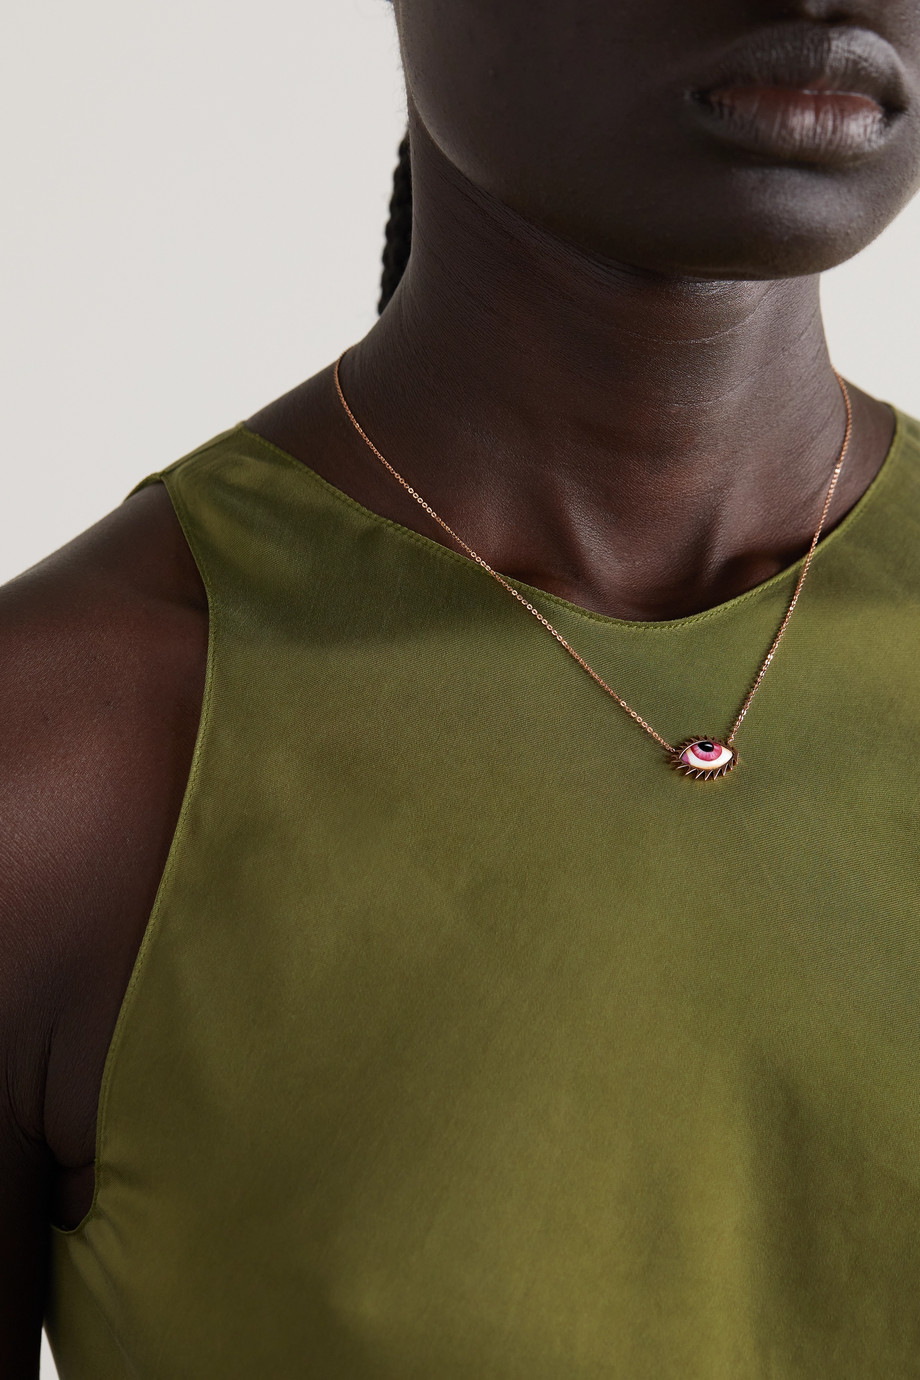 Lito Apollo 13 Petite Pink 14-karat rose gold and enamel necklace